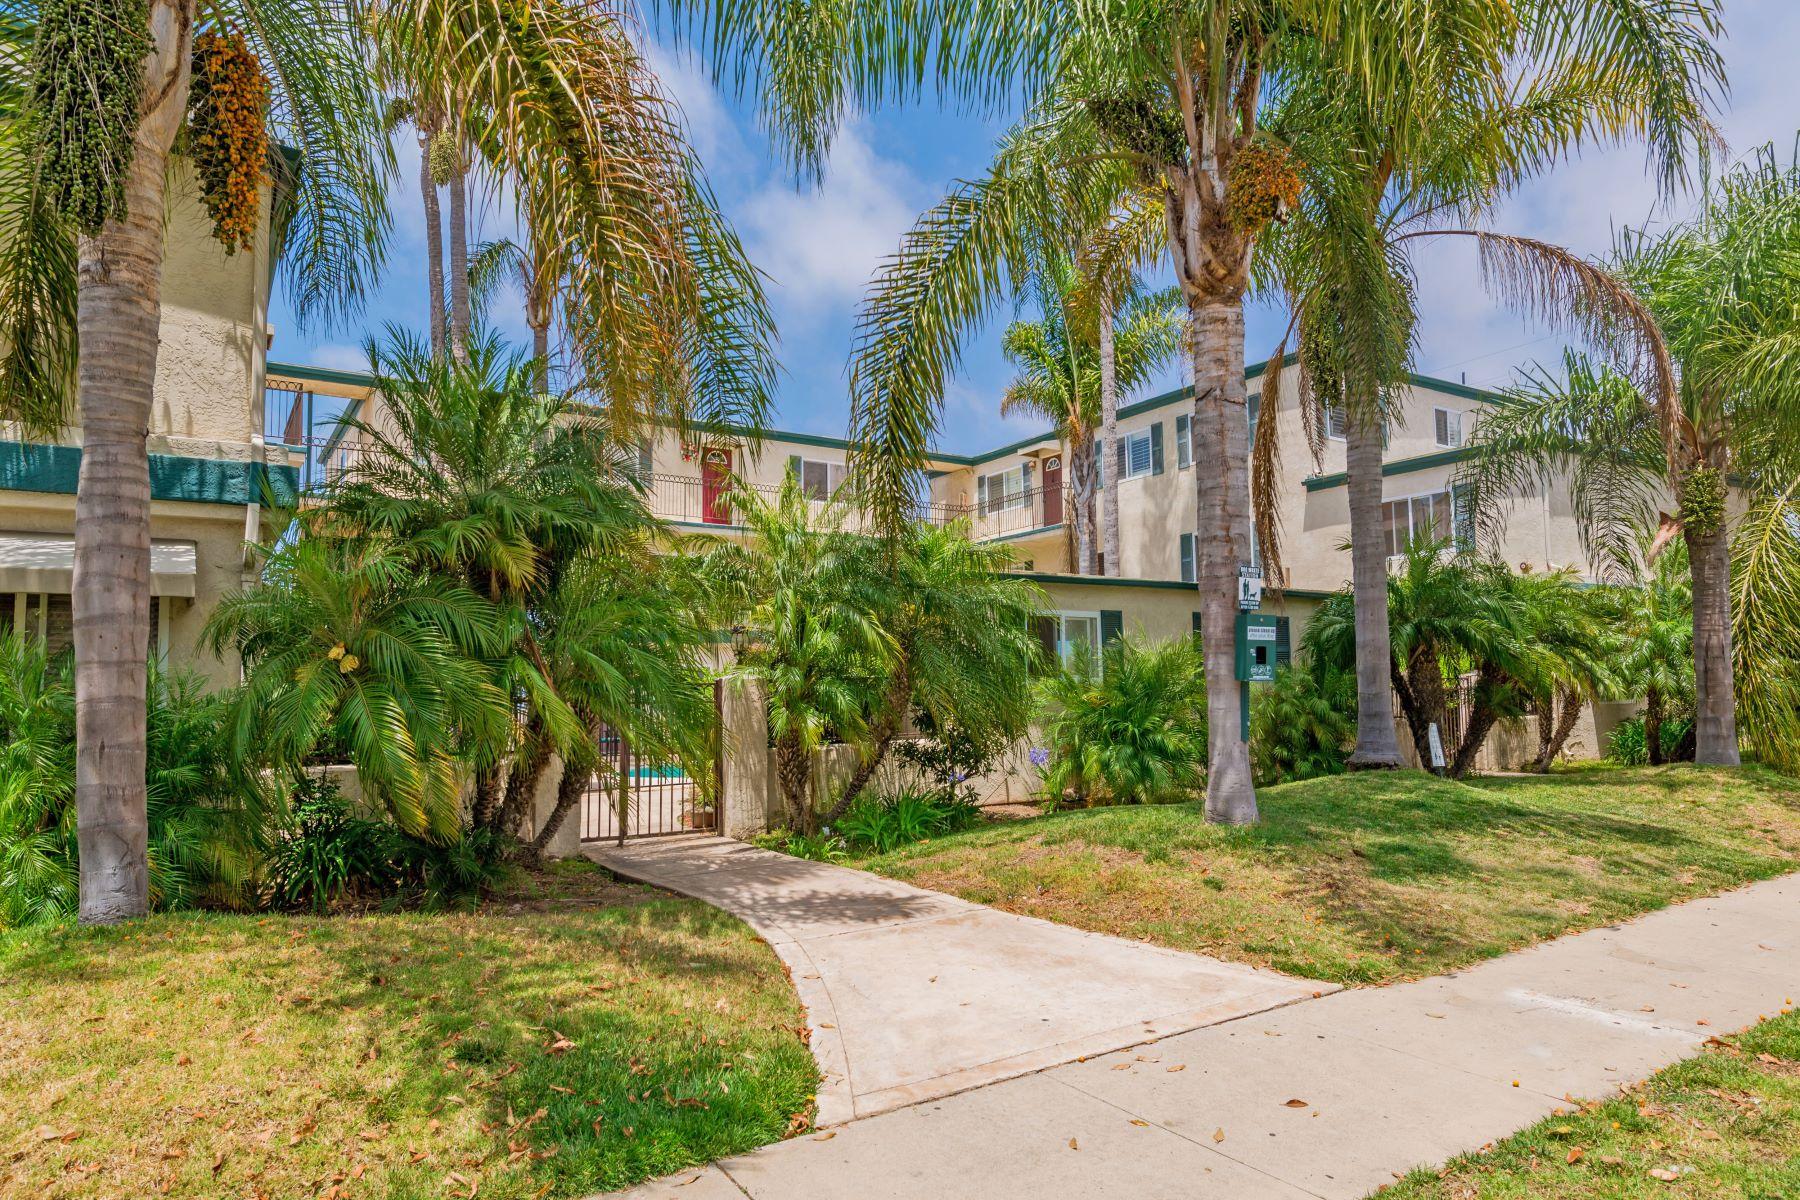 Condominiums for Sale at 940 Calla Ave 1 Imperial Beach, California 91932 United States